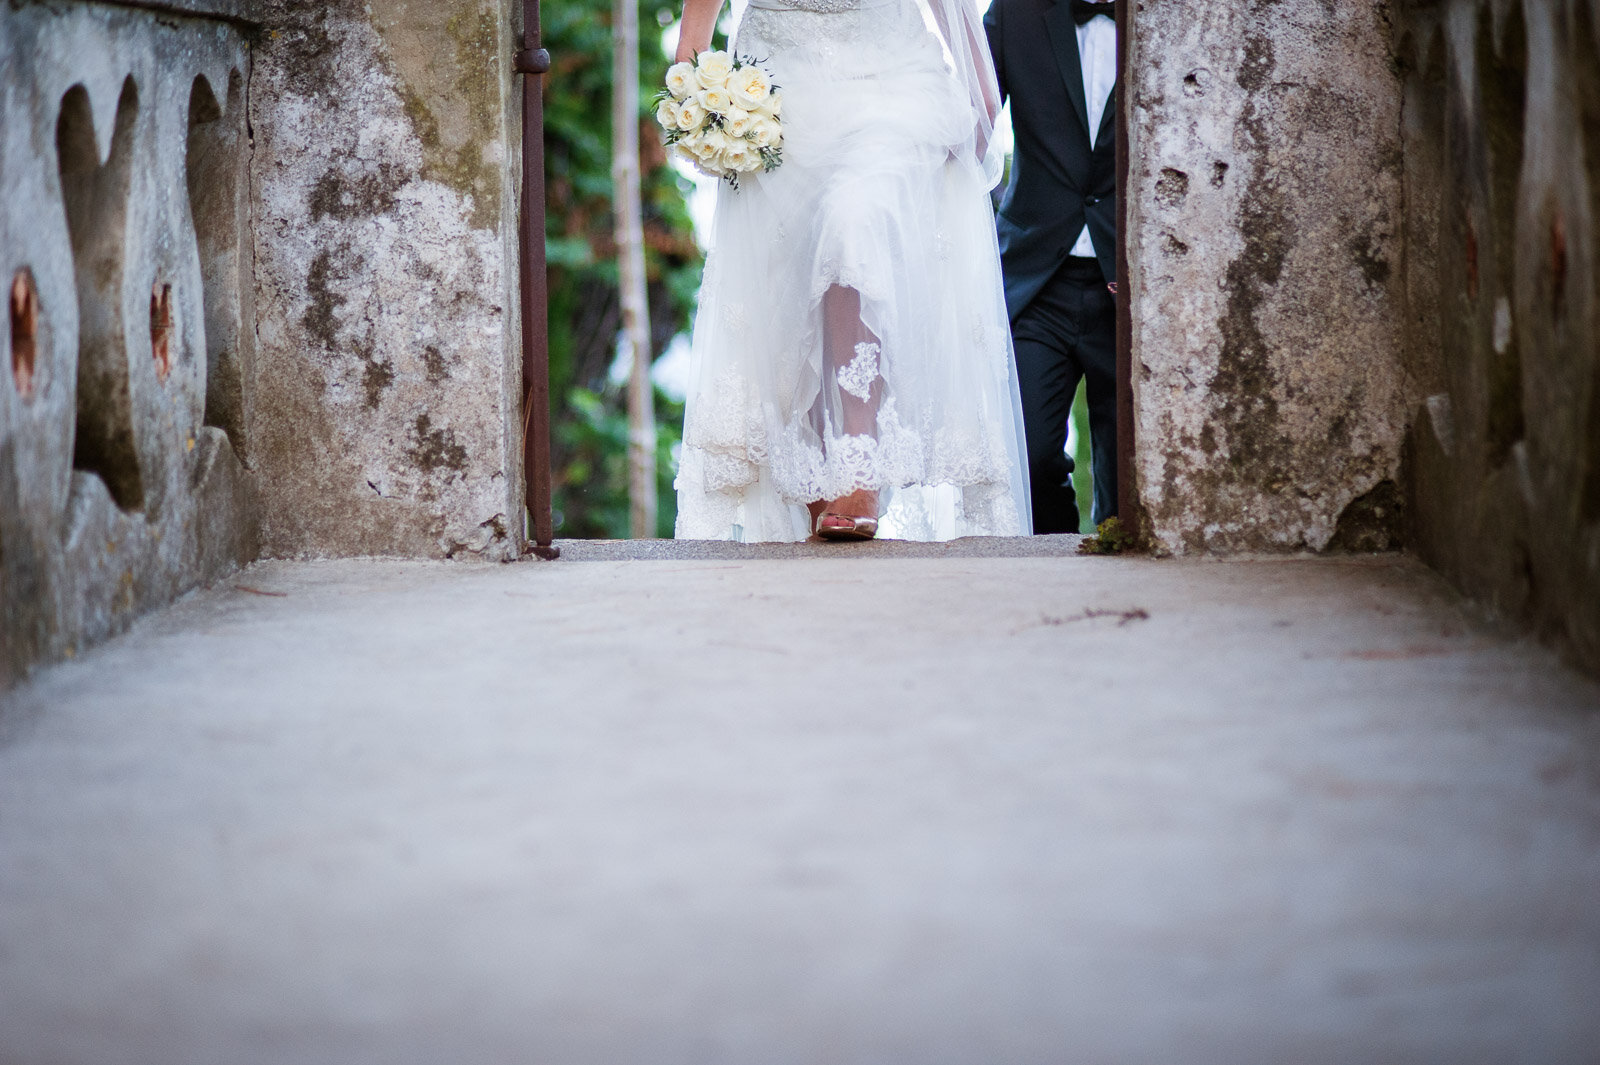 Russian Wedding in Villa Cimbrone Costiera Amalfitana 22.jpg